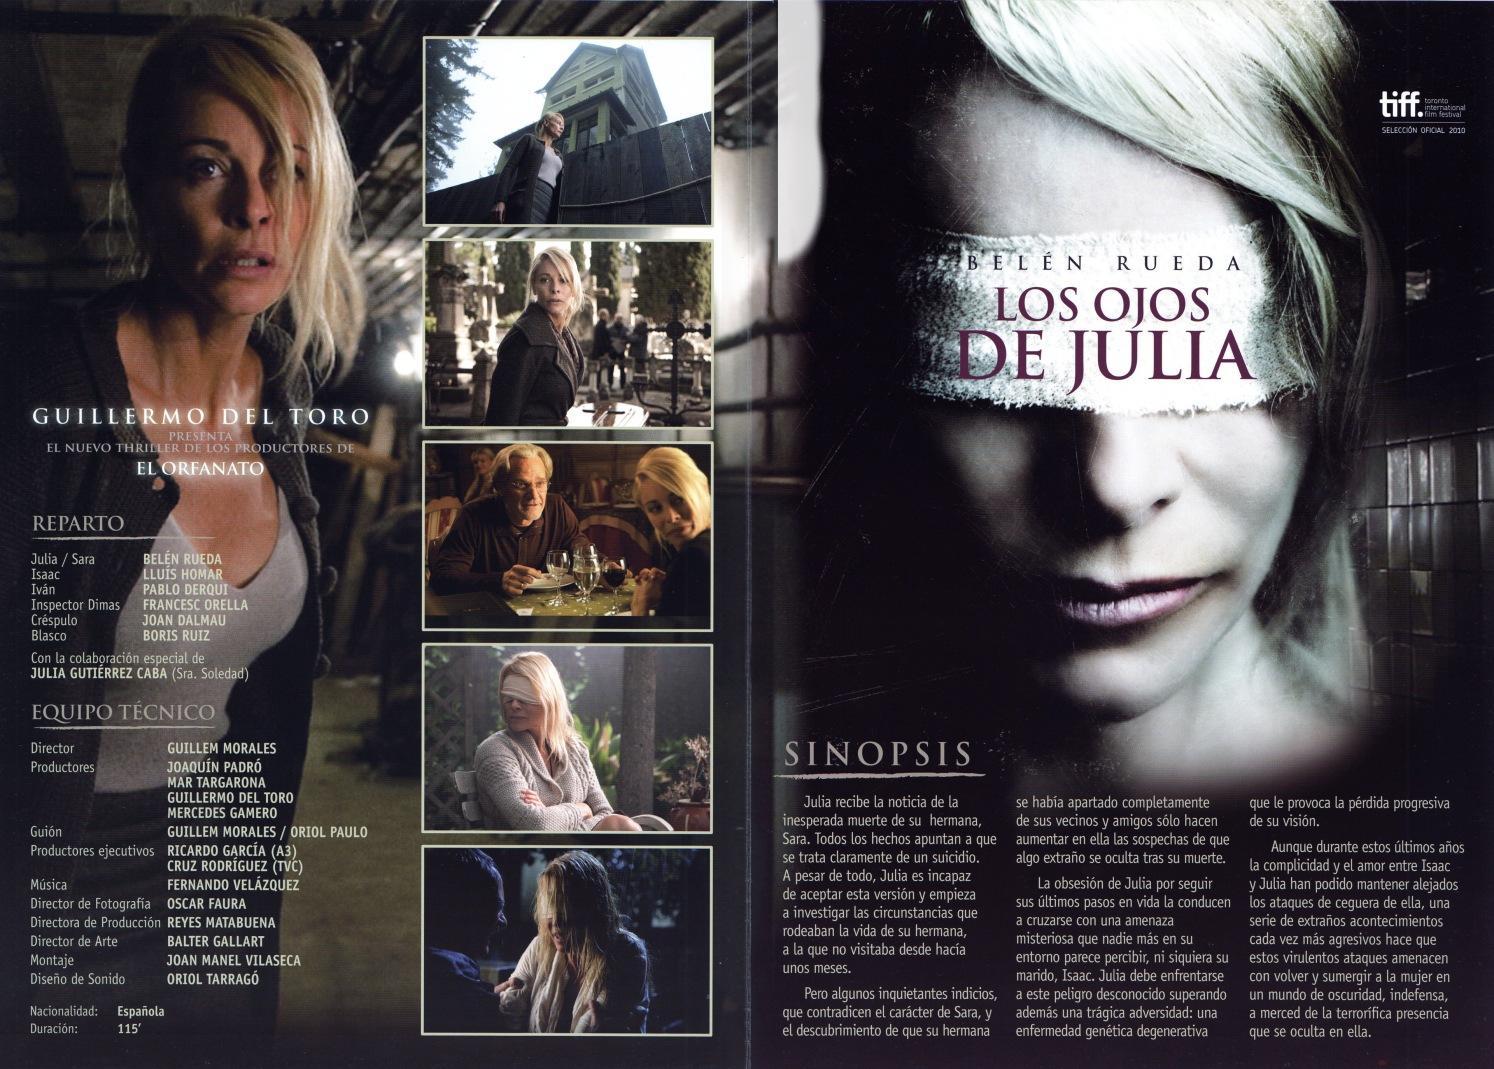 theeyesofjulia-pressbook-spain-2